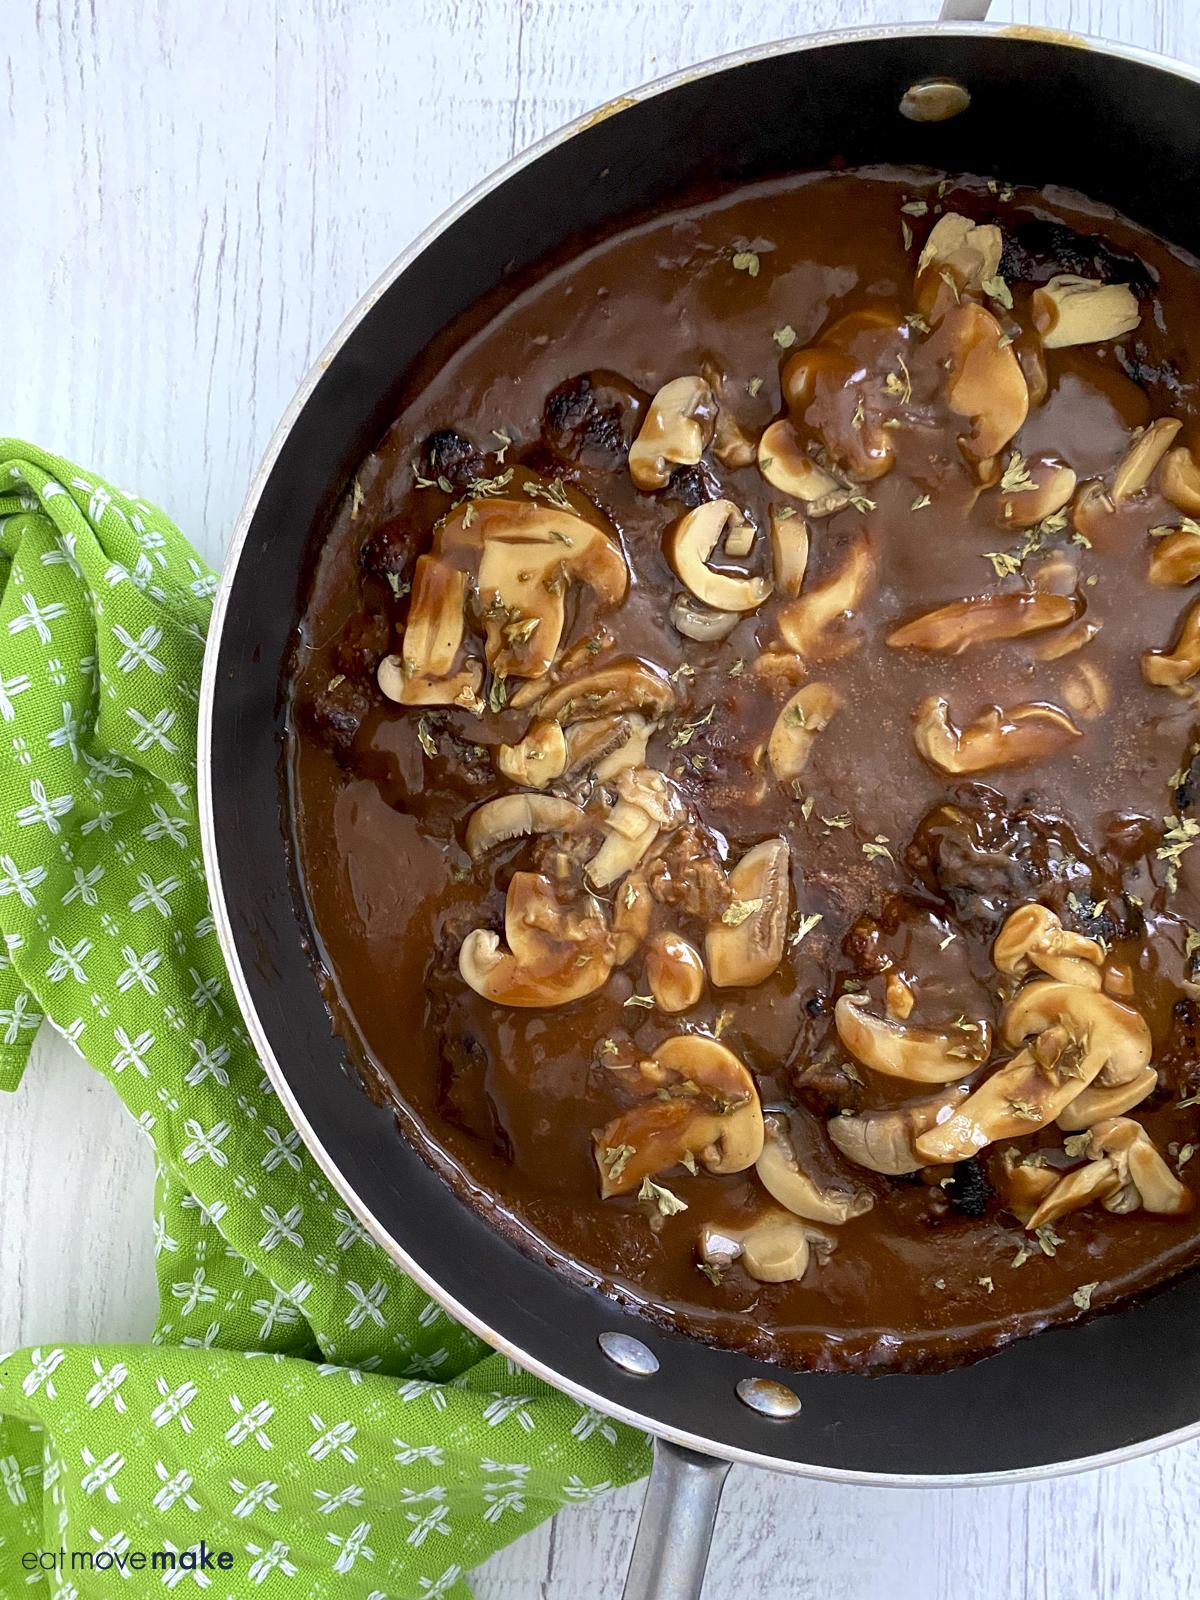 grilled salisbury steak with mushrooms